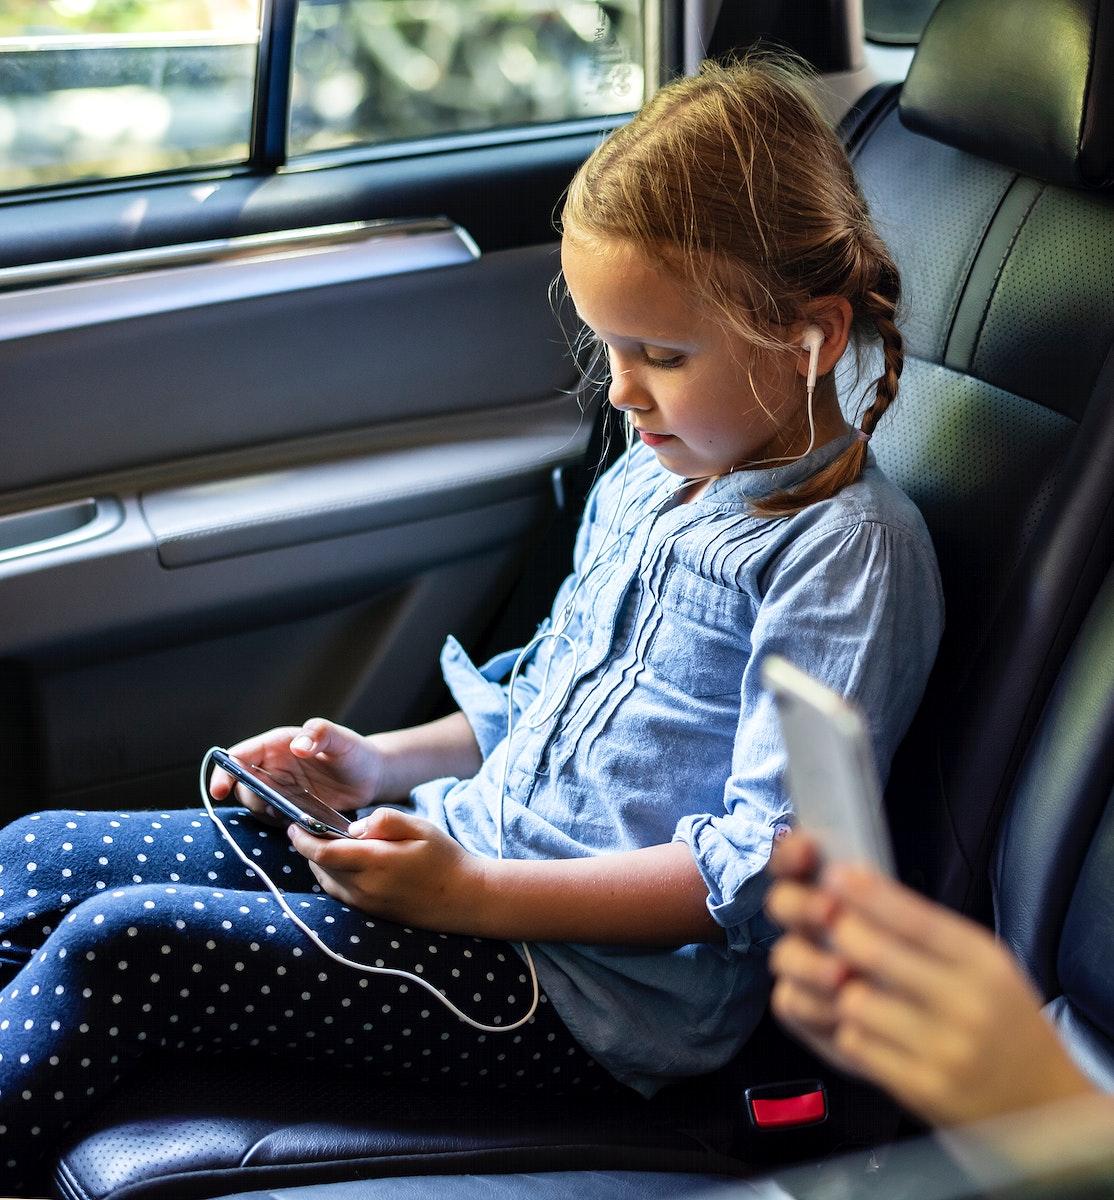 Girl in a car using a digital device